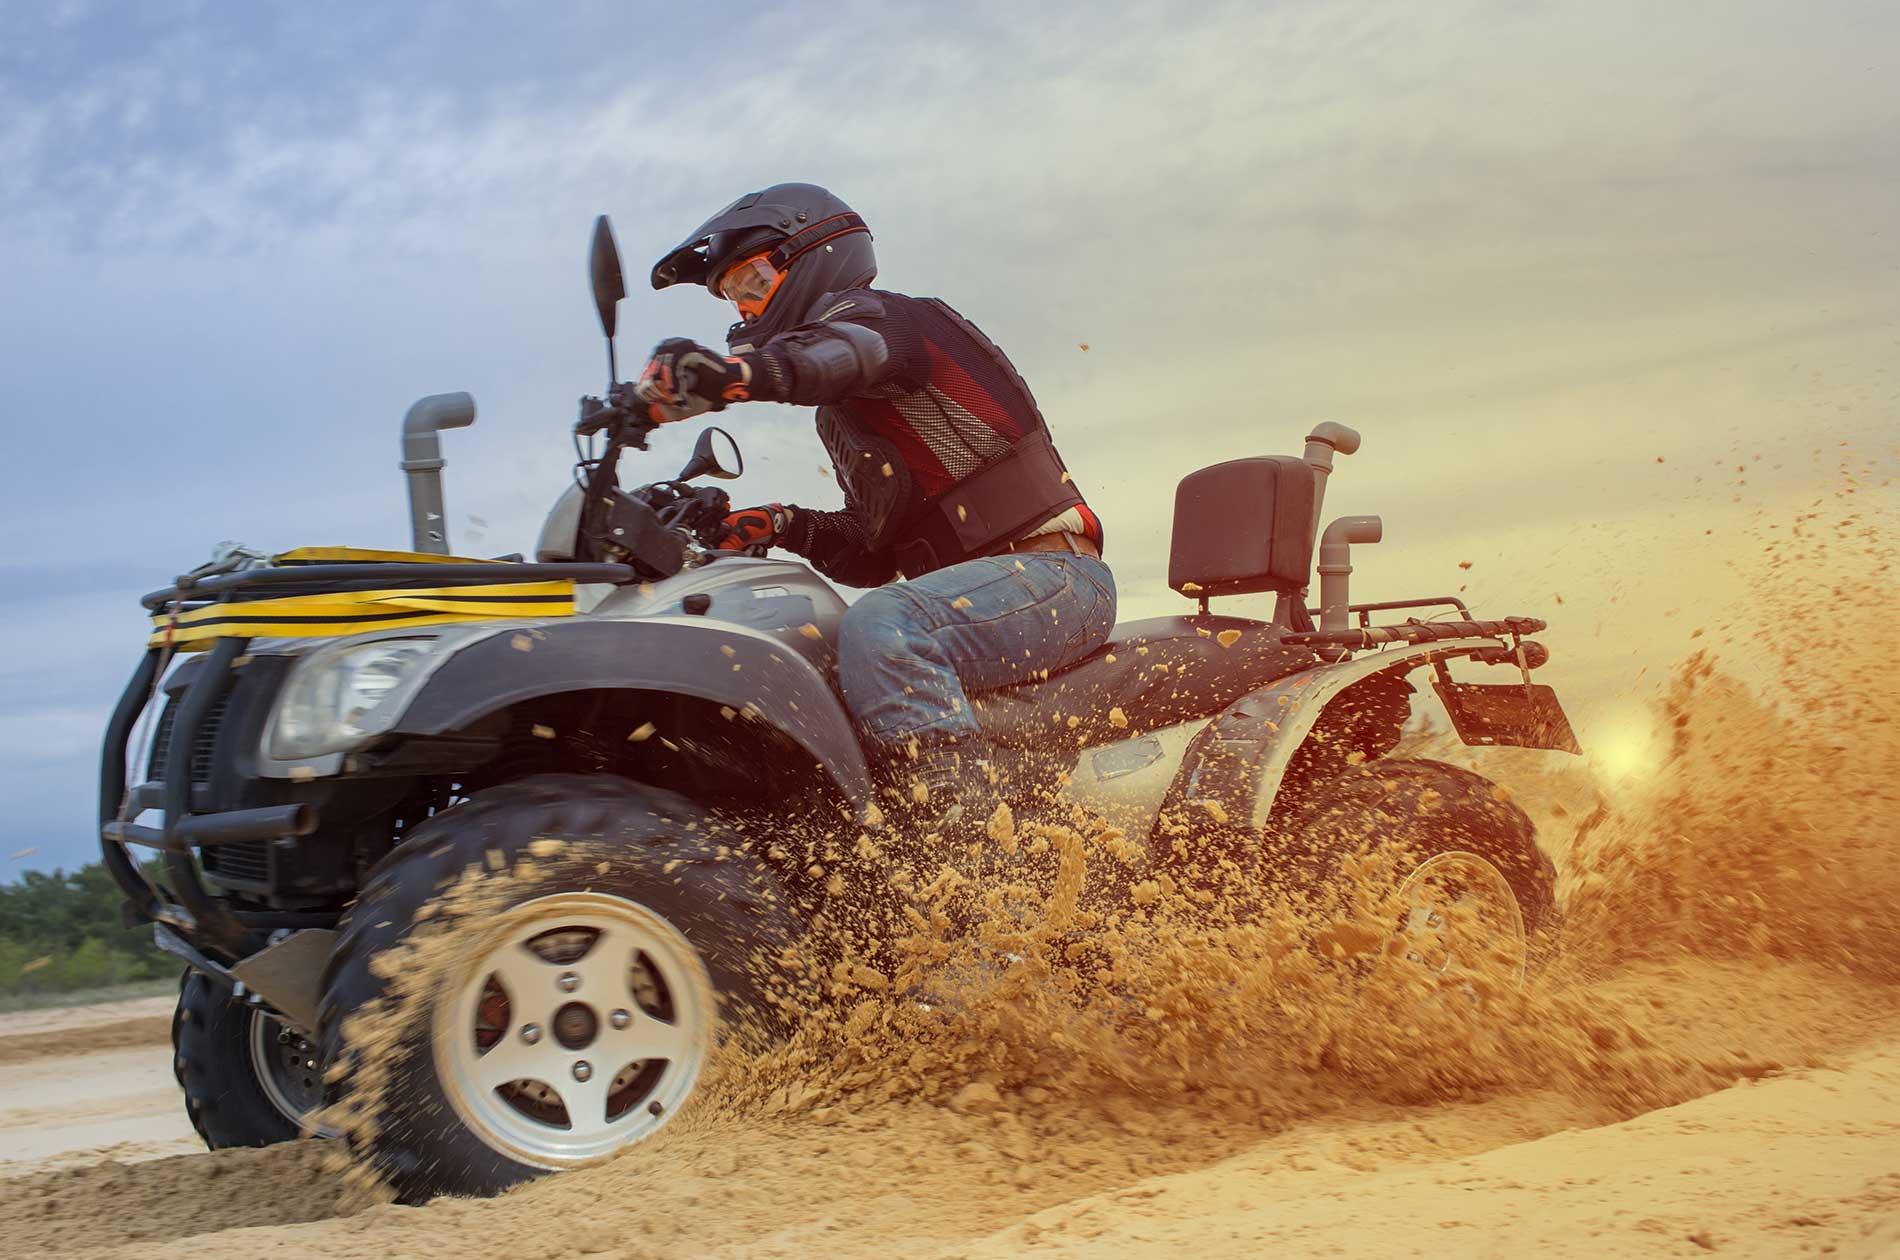 An ATV rider